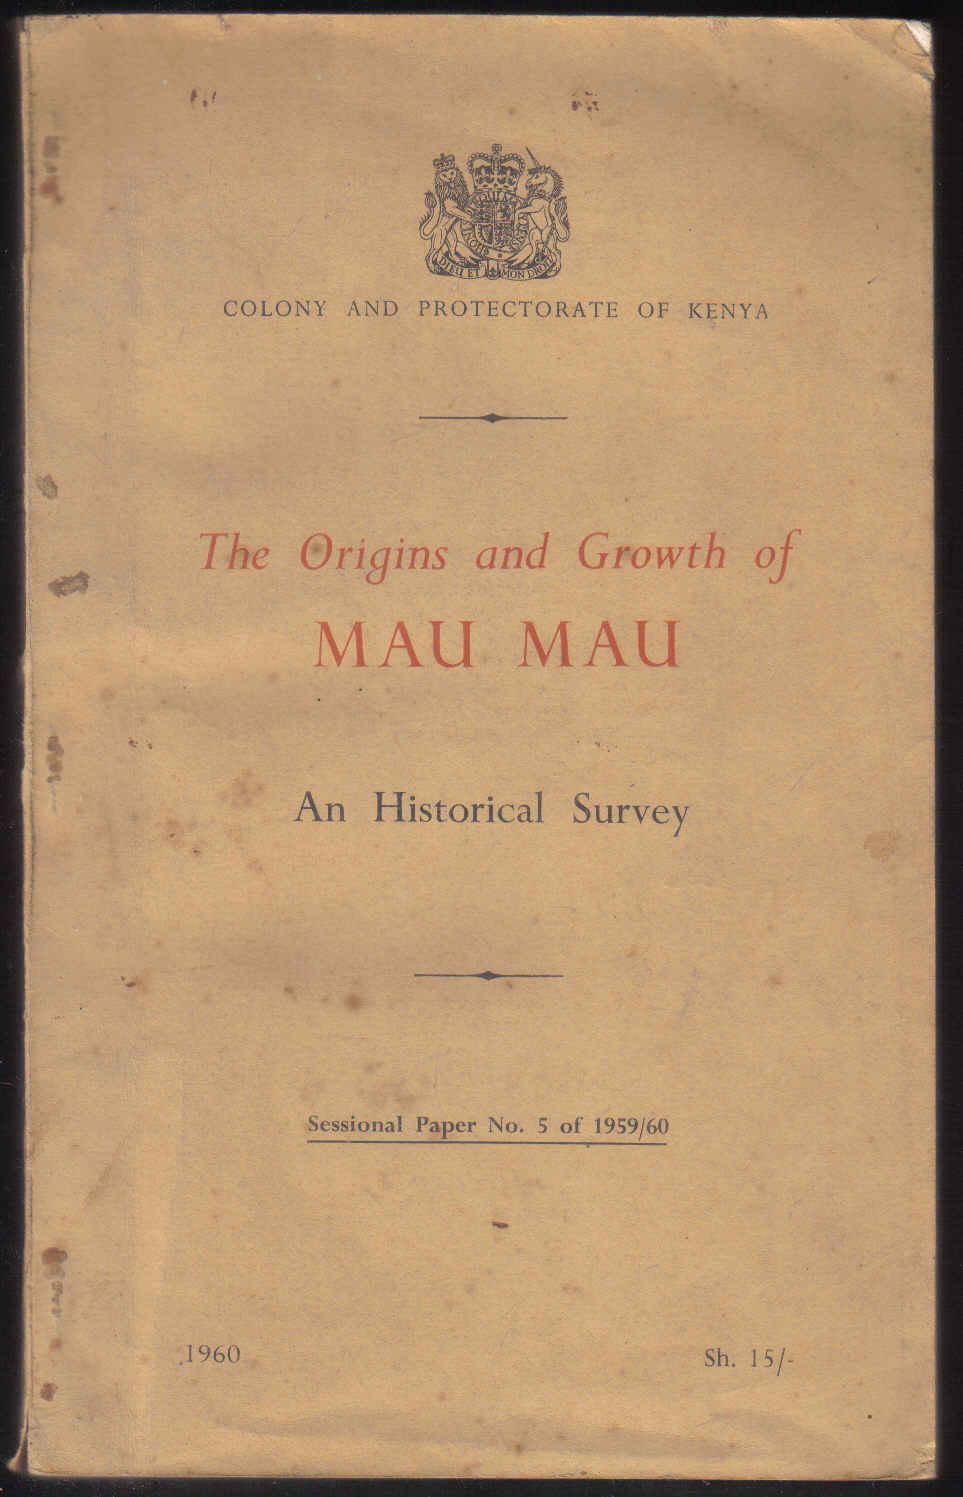 The Origins and Growth of the Mau Mau